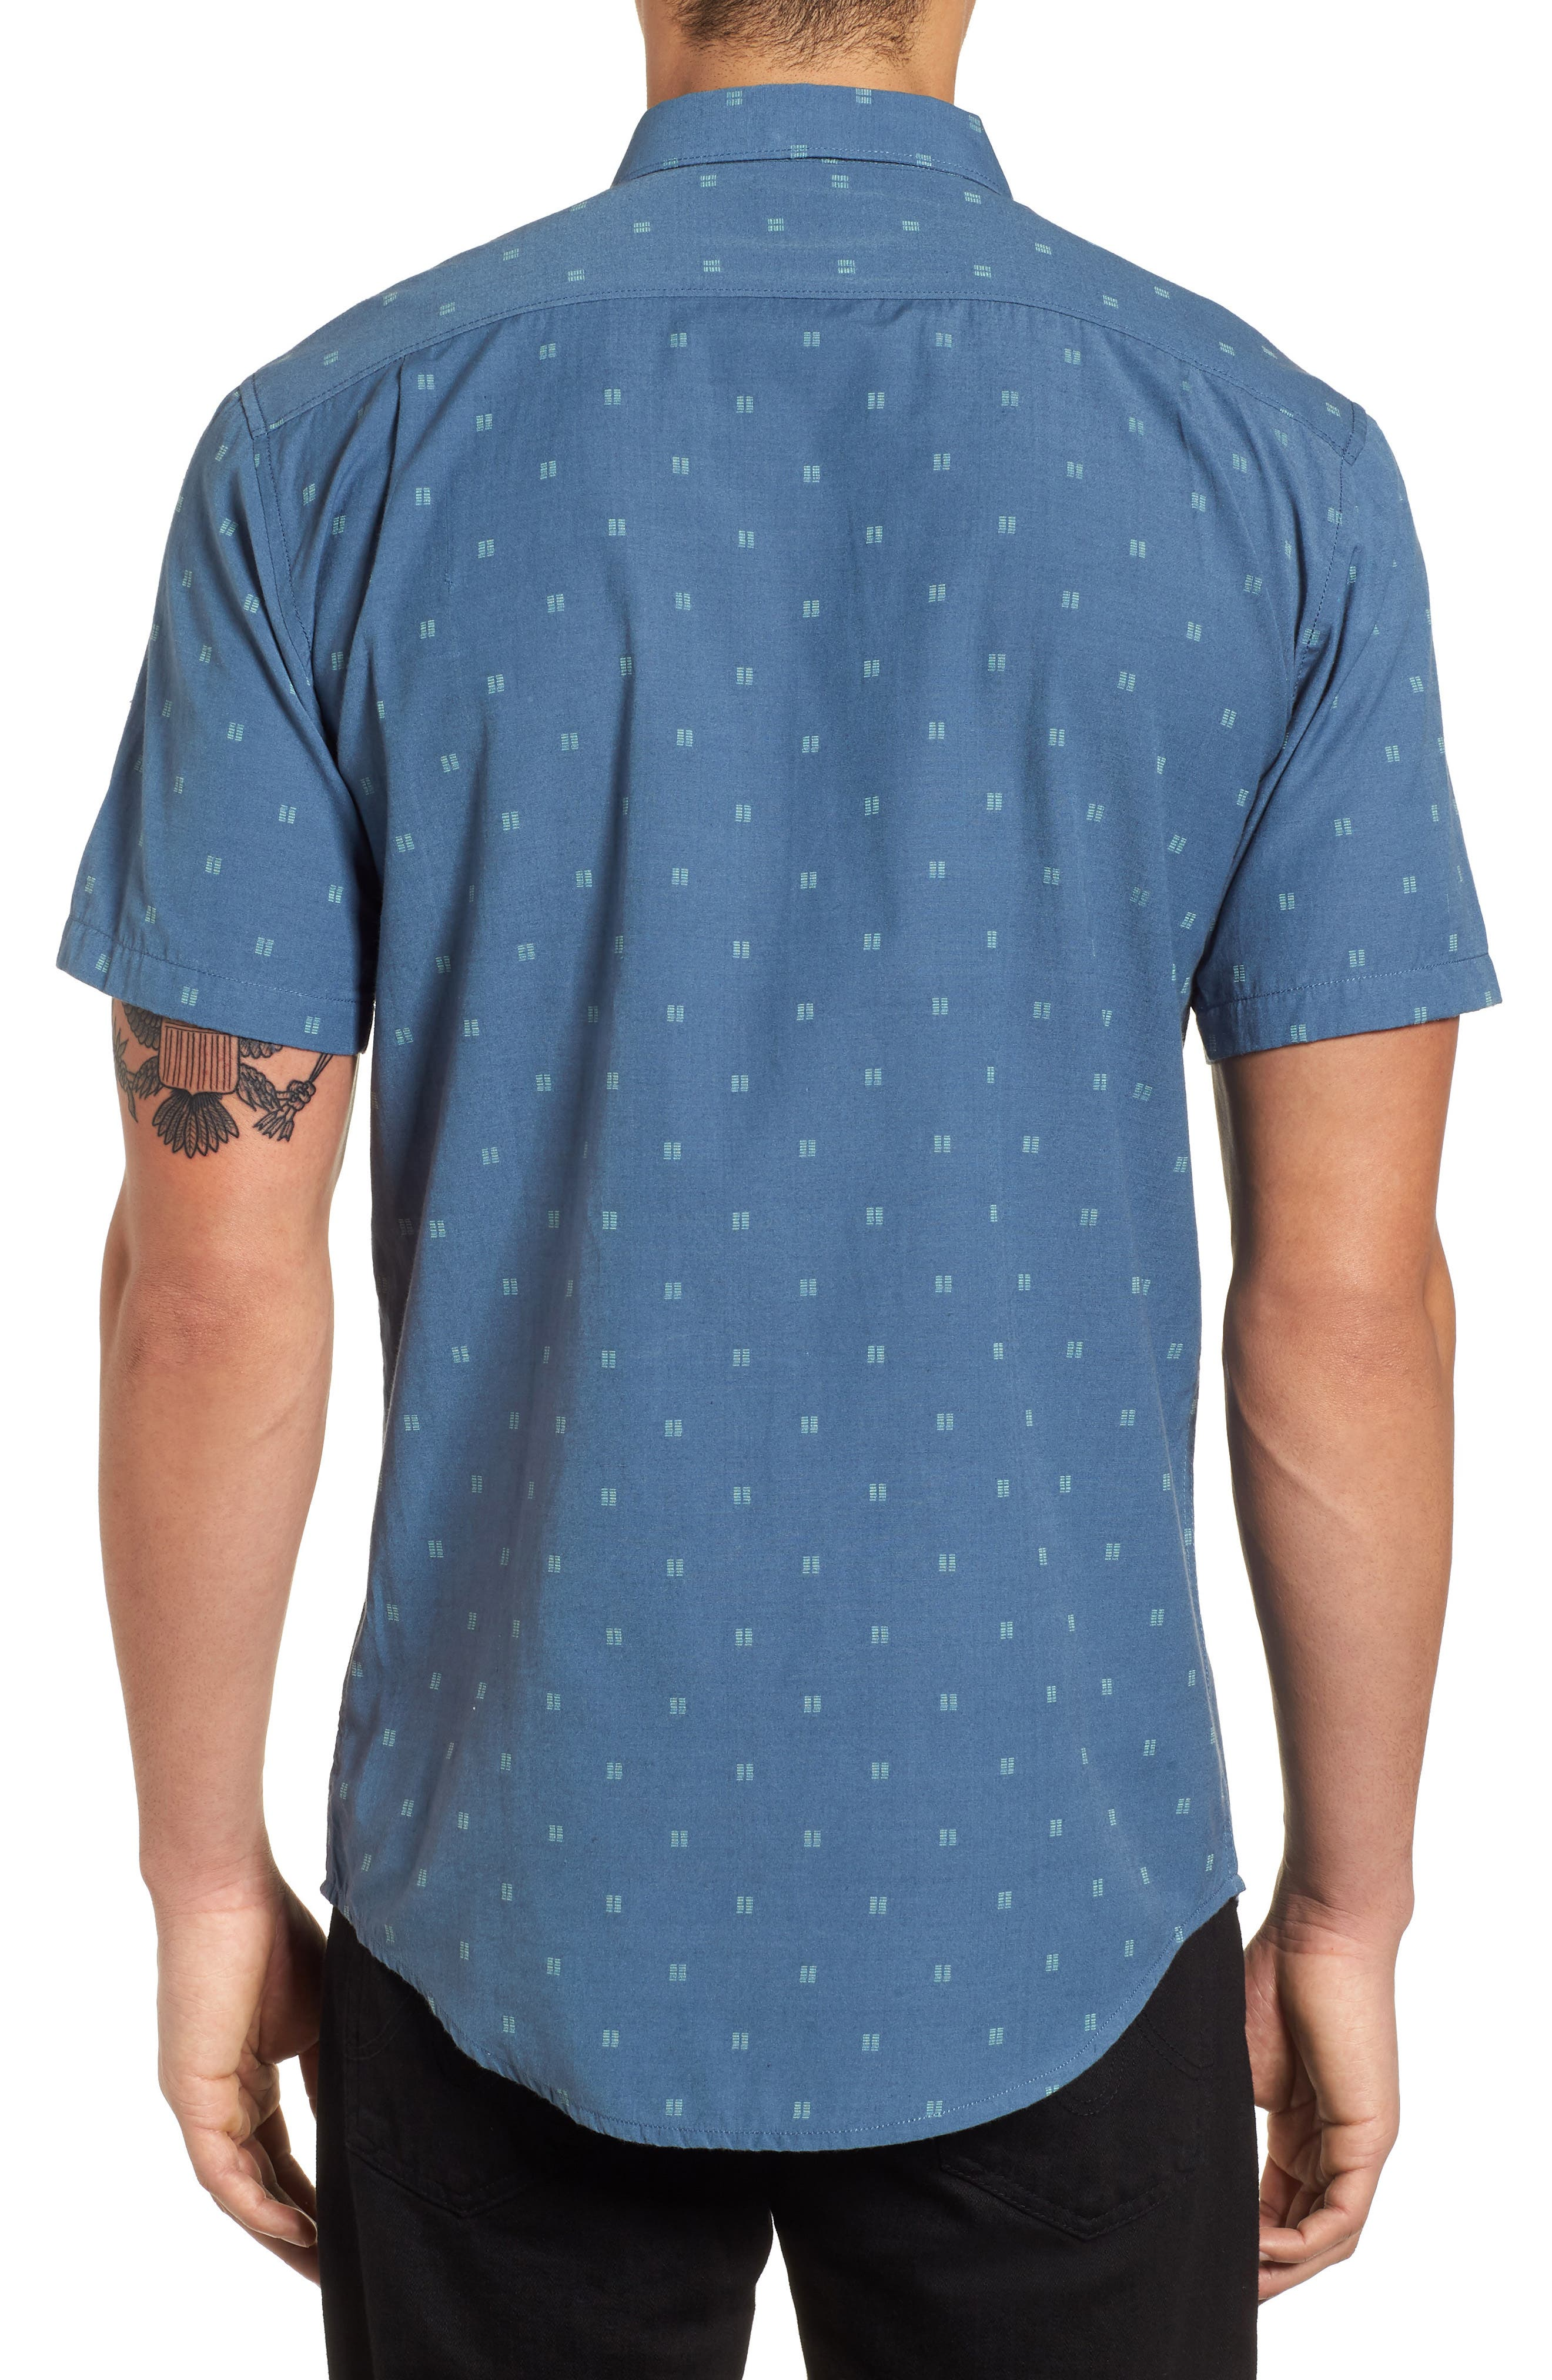 All Day Jacquard Shirt,                             Alternate thumbnail 3, color,                             Deep Blue